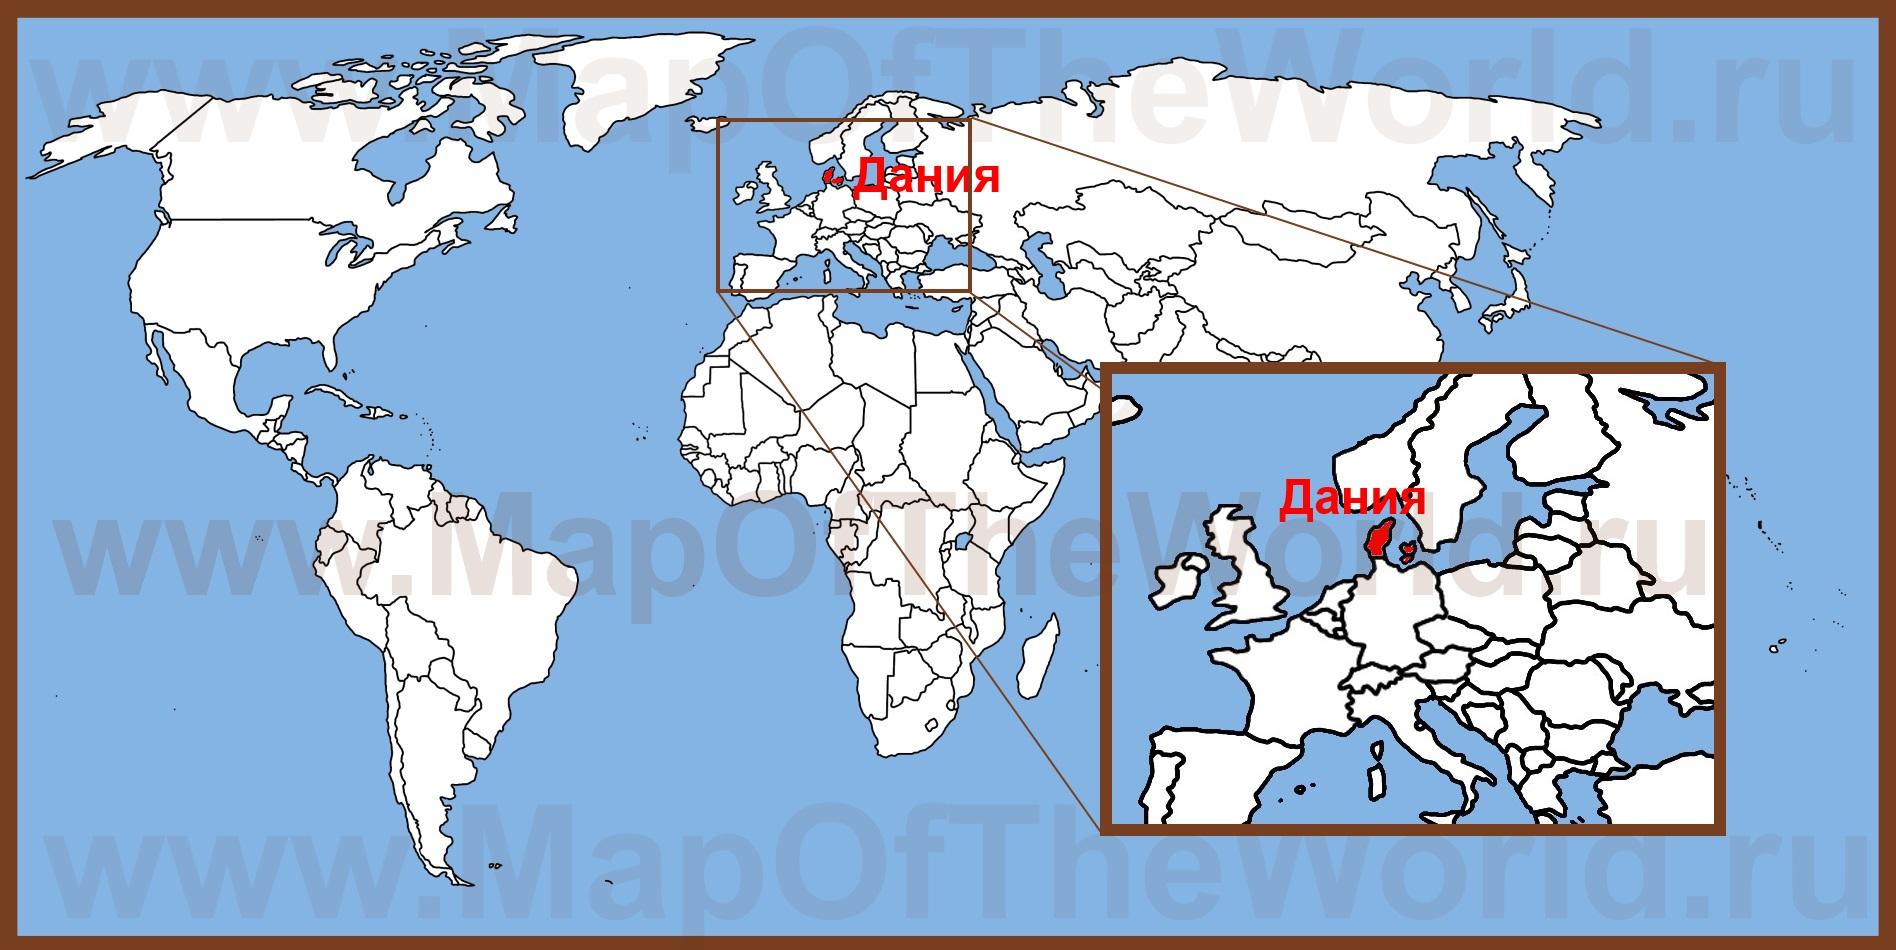 Daniya Na Karte Mira I Evropy